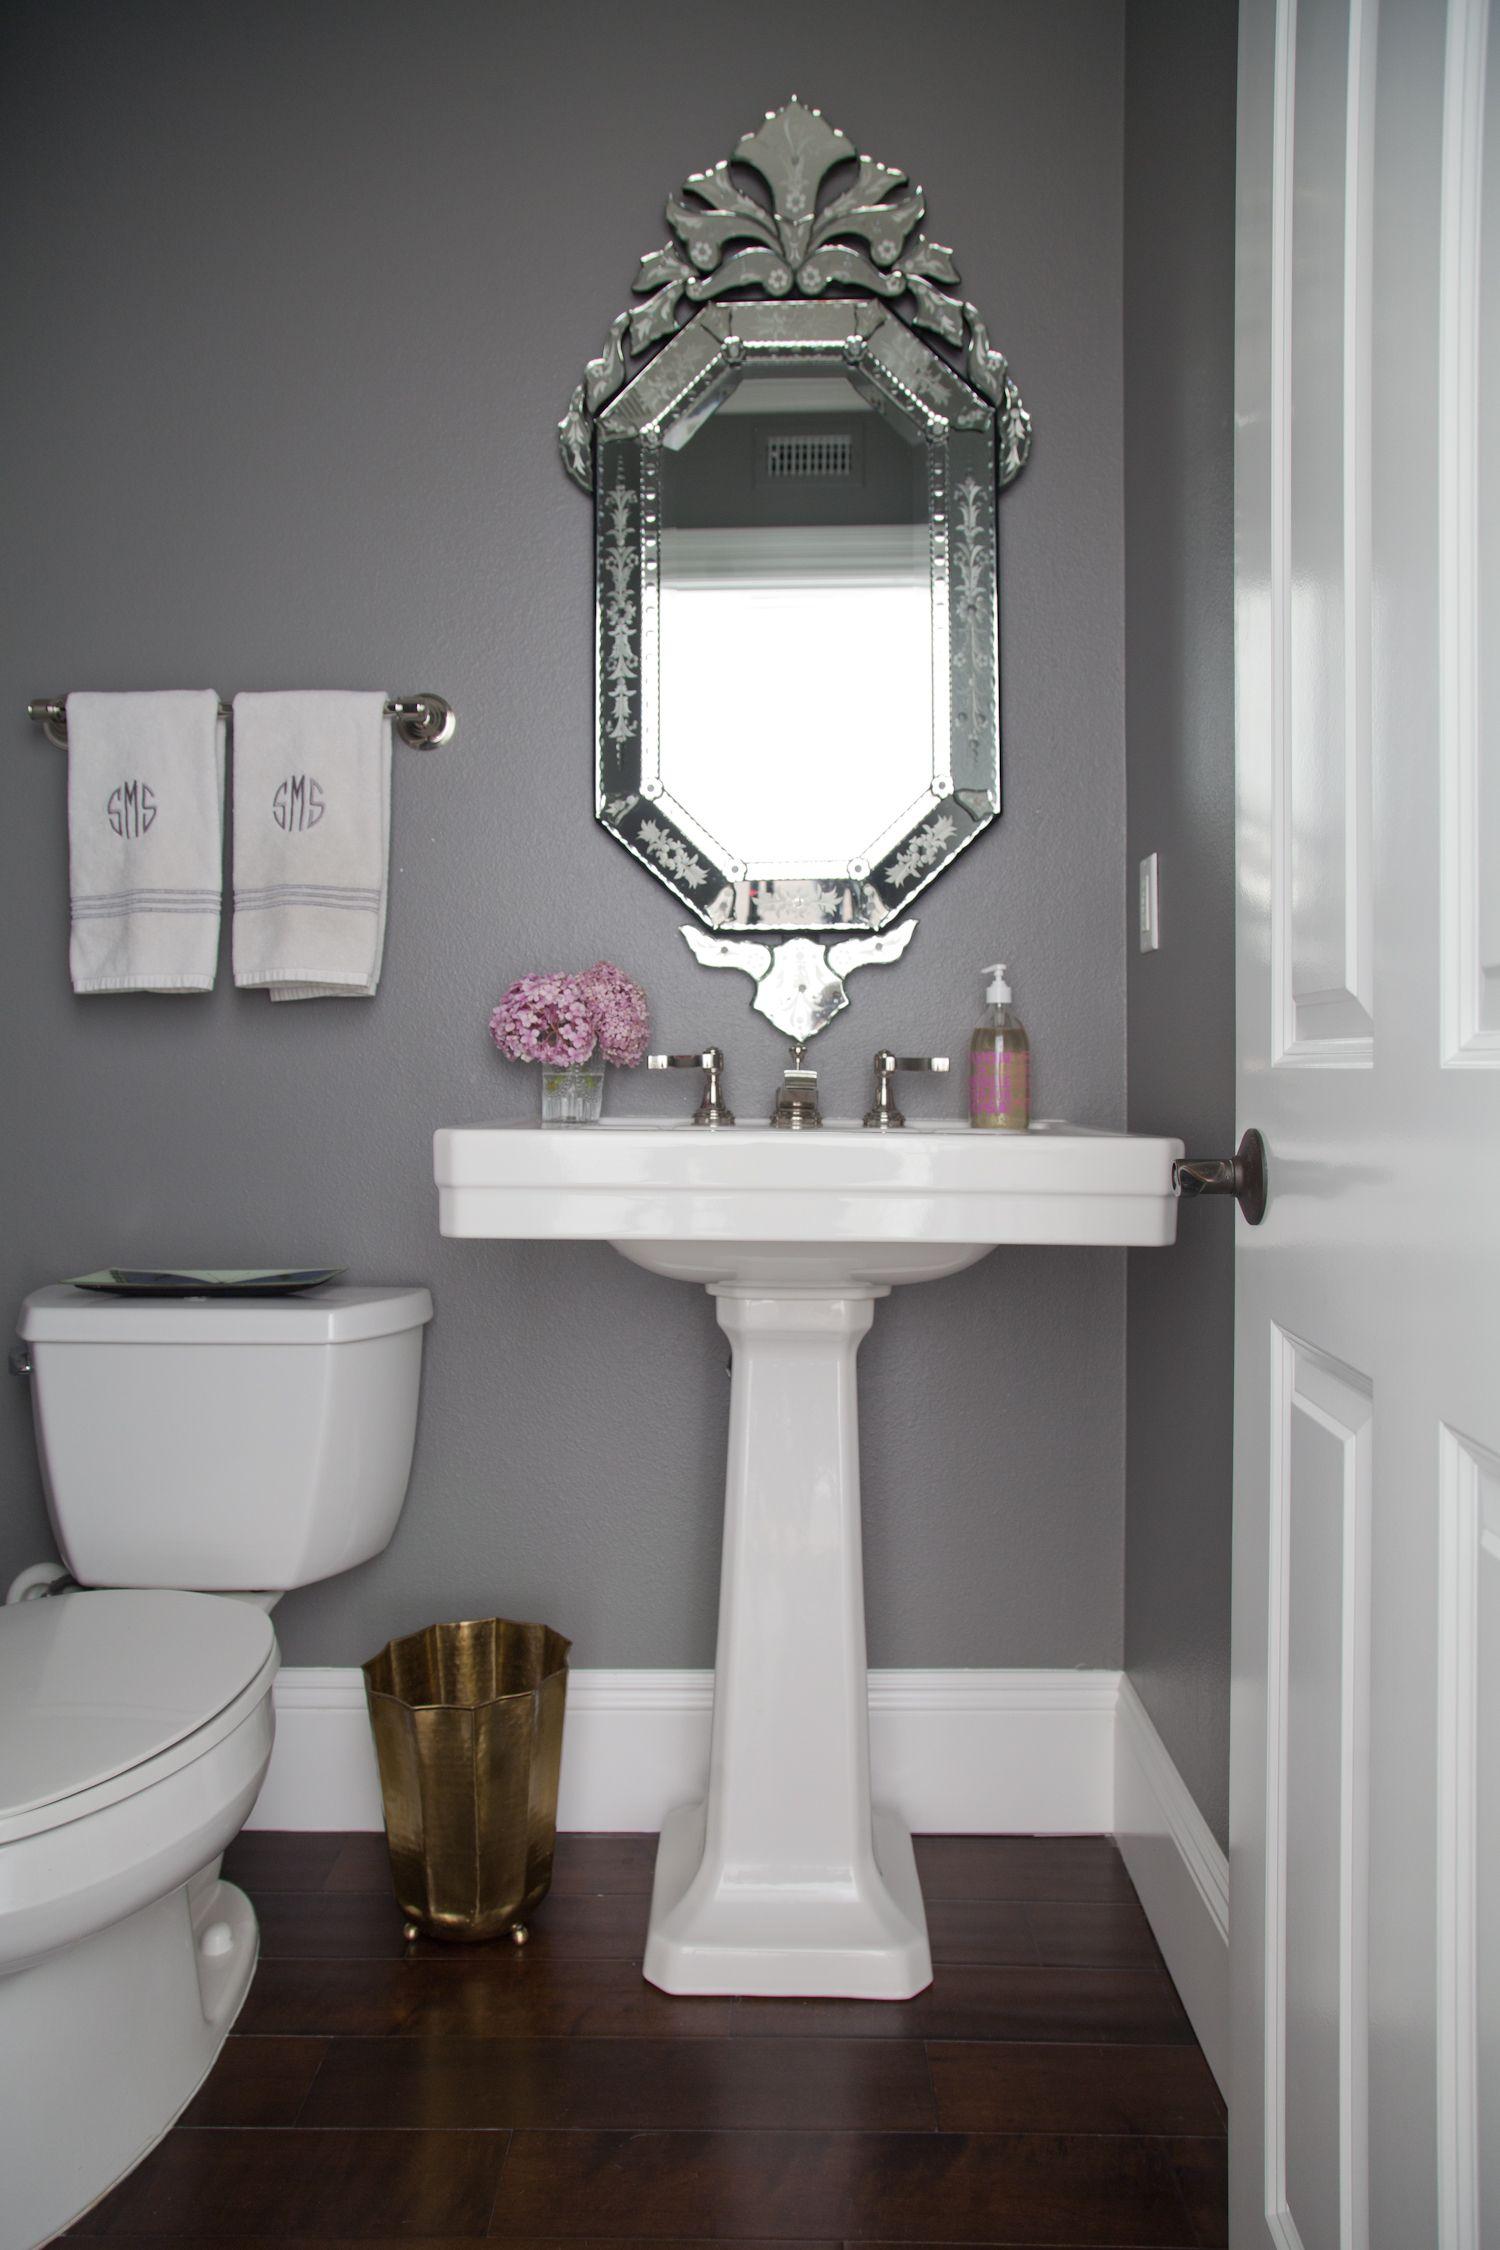 Studio Mcgee Grey Powder Room Benj Moore Chelsea Gray Venetian Mirror Ebay Br Wastebasket